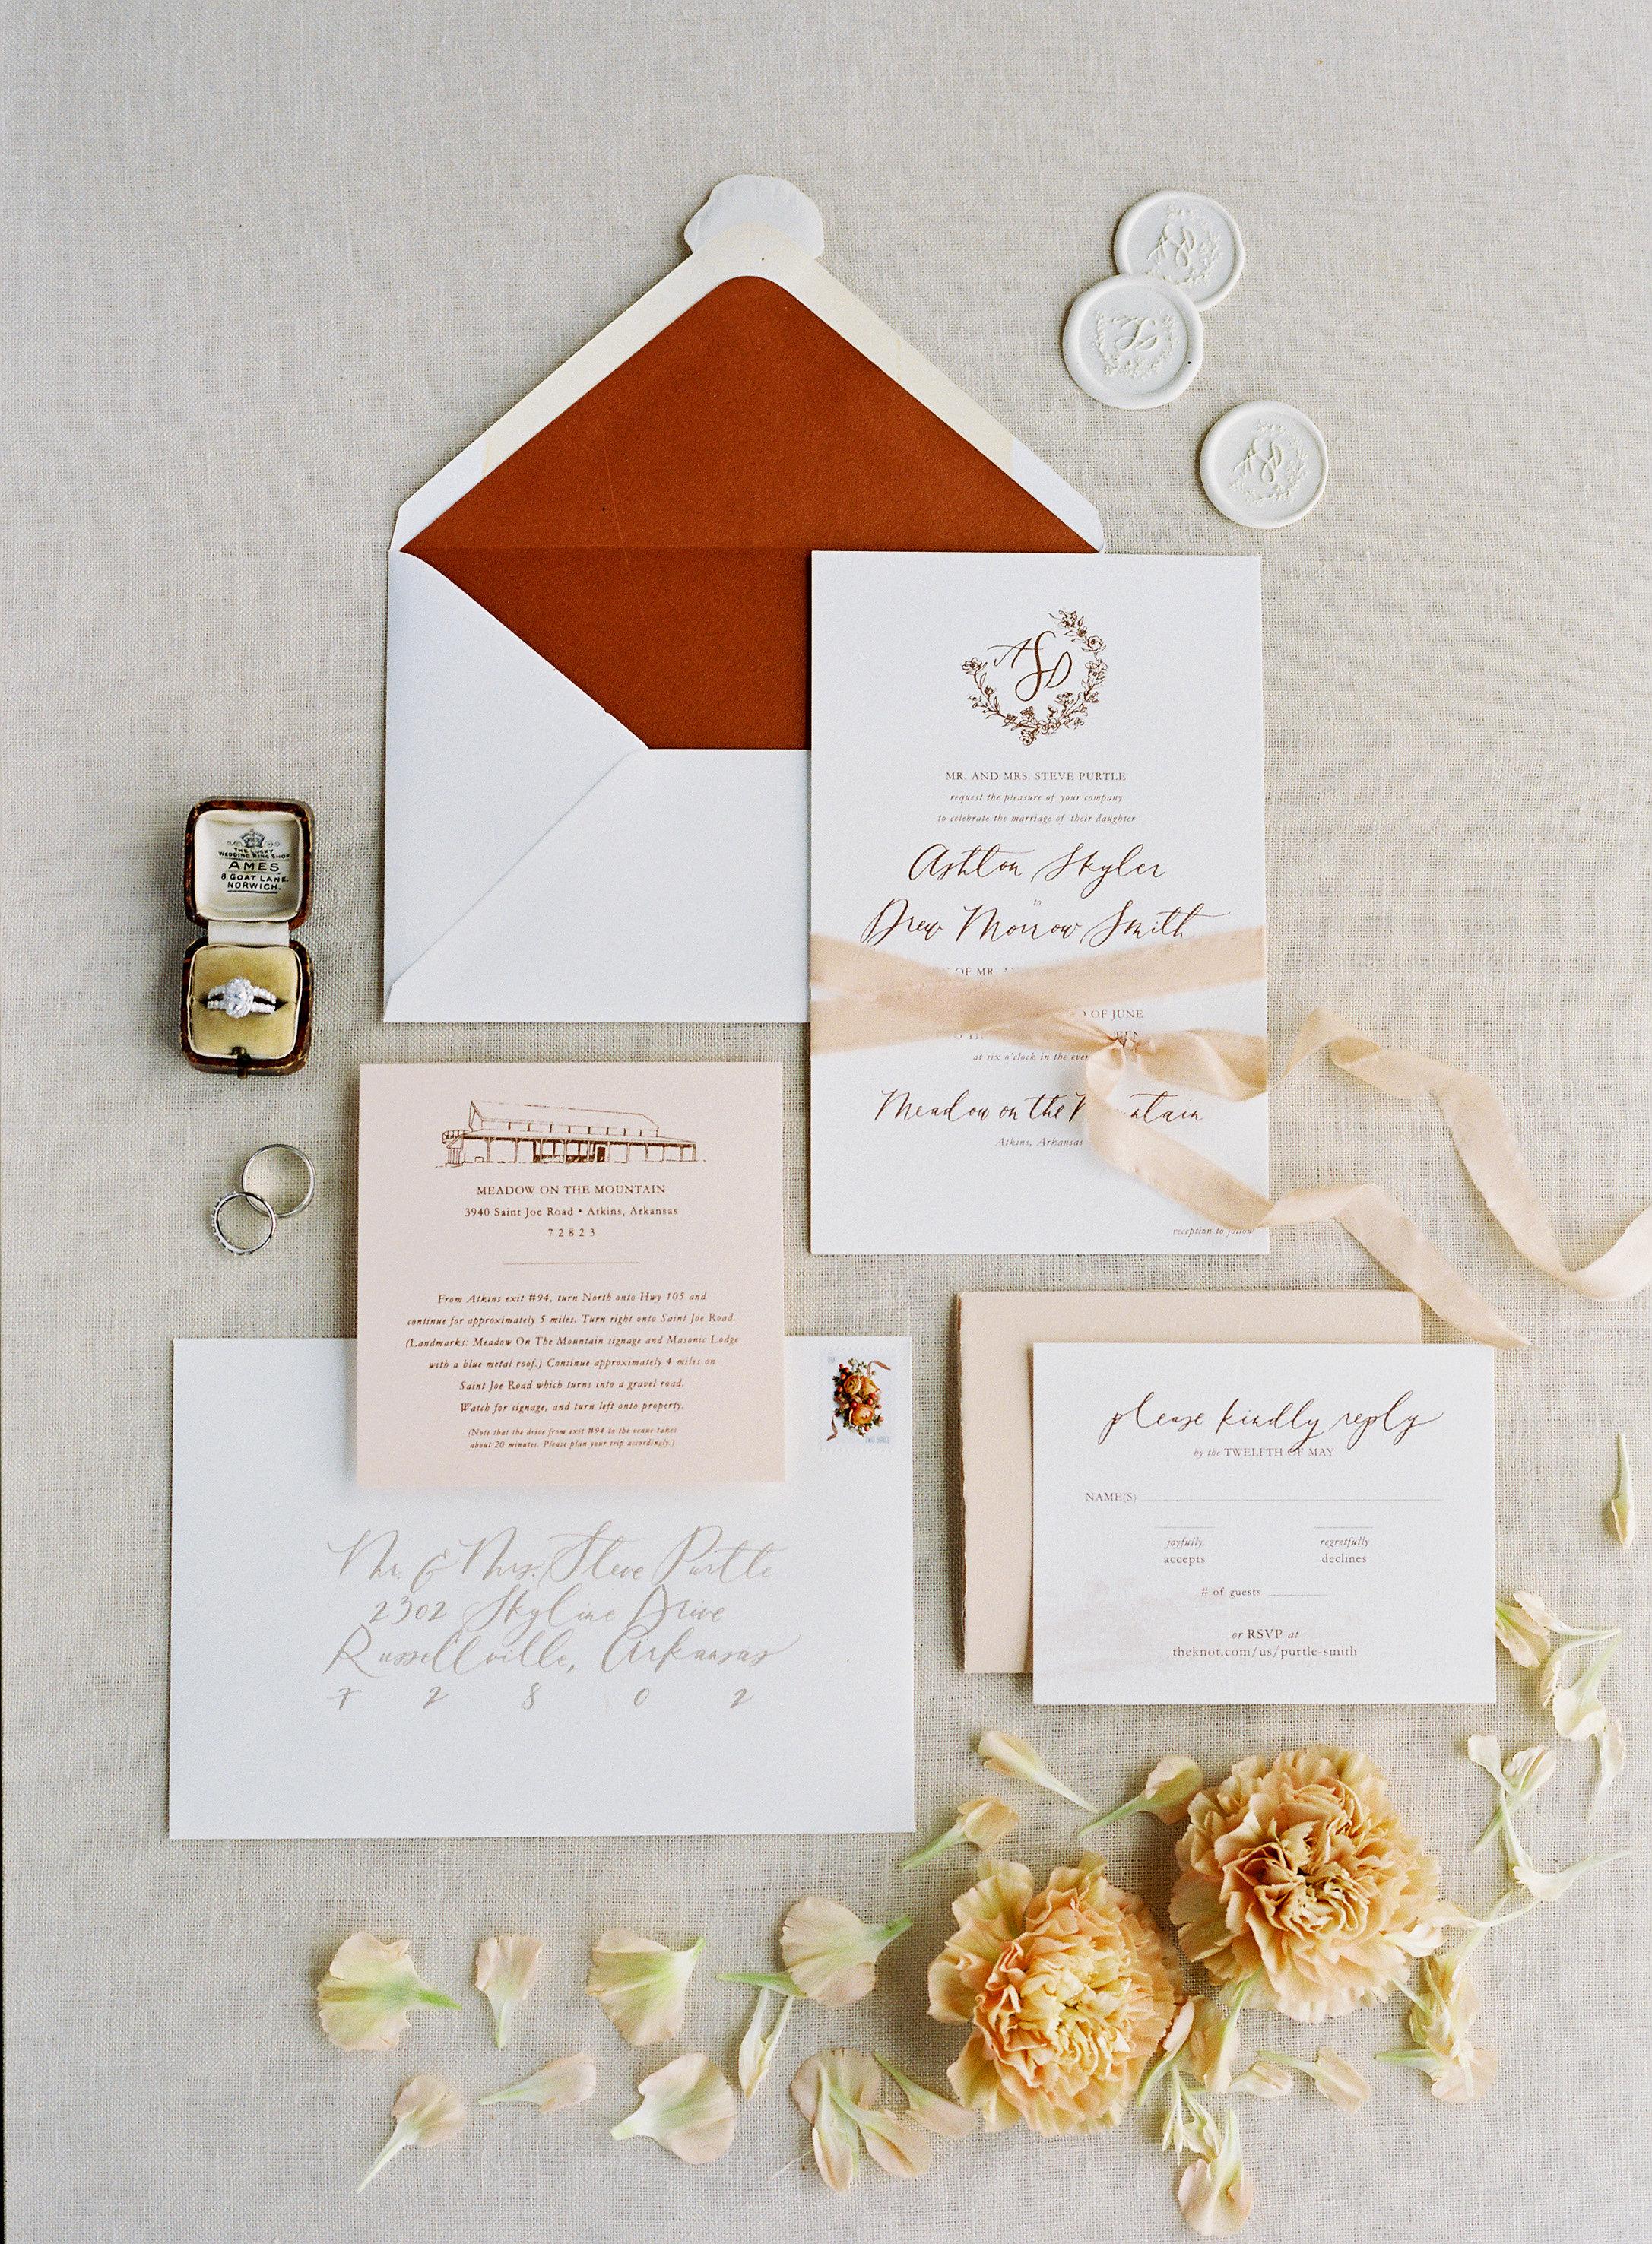 jessica-zimmerman-events-arkansas-mountain-wedding-paper-goods.jpg